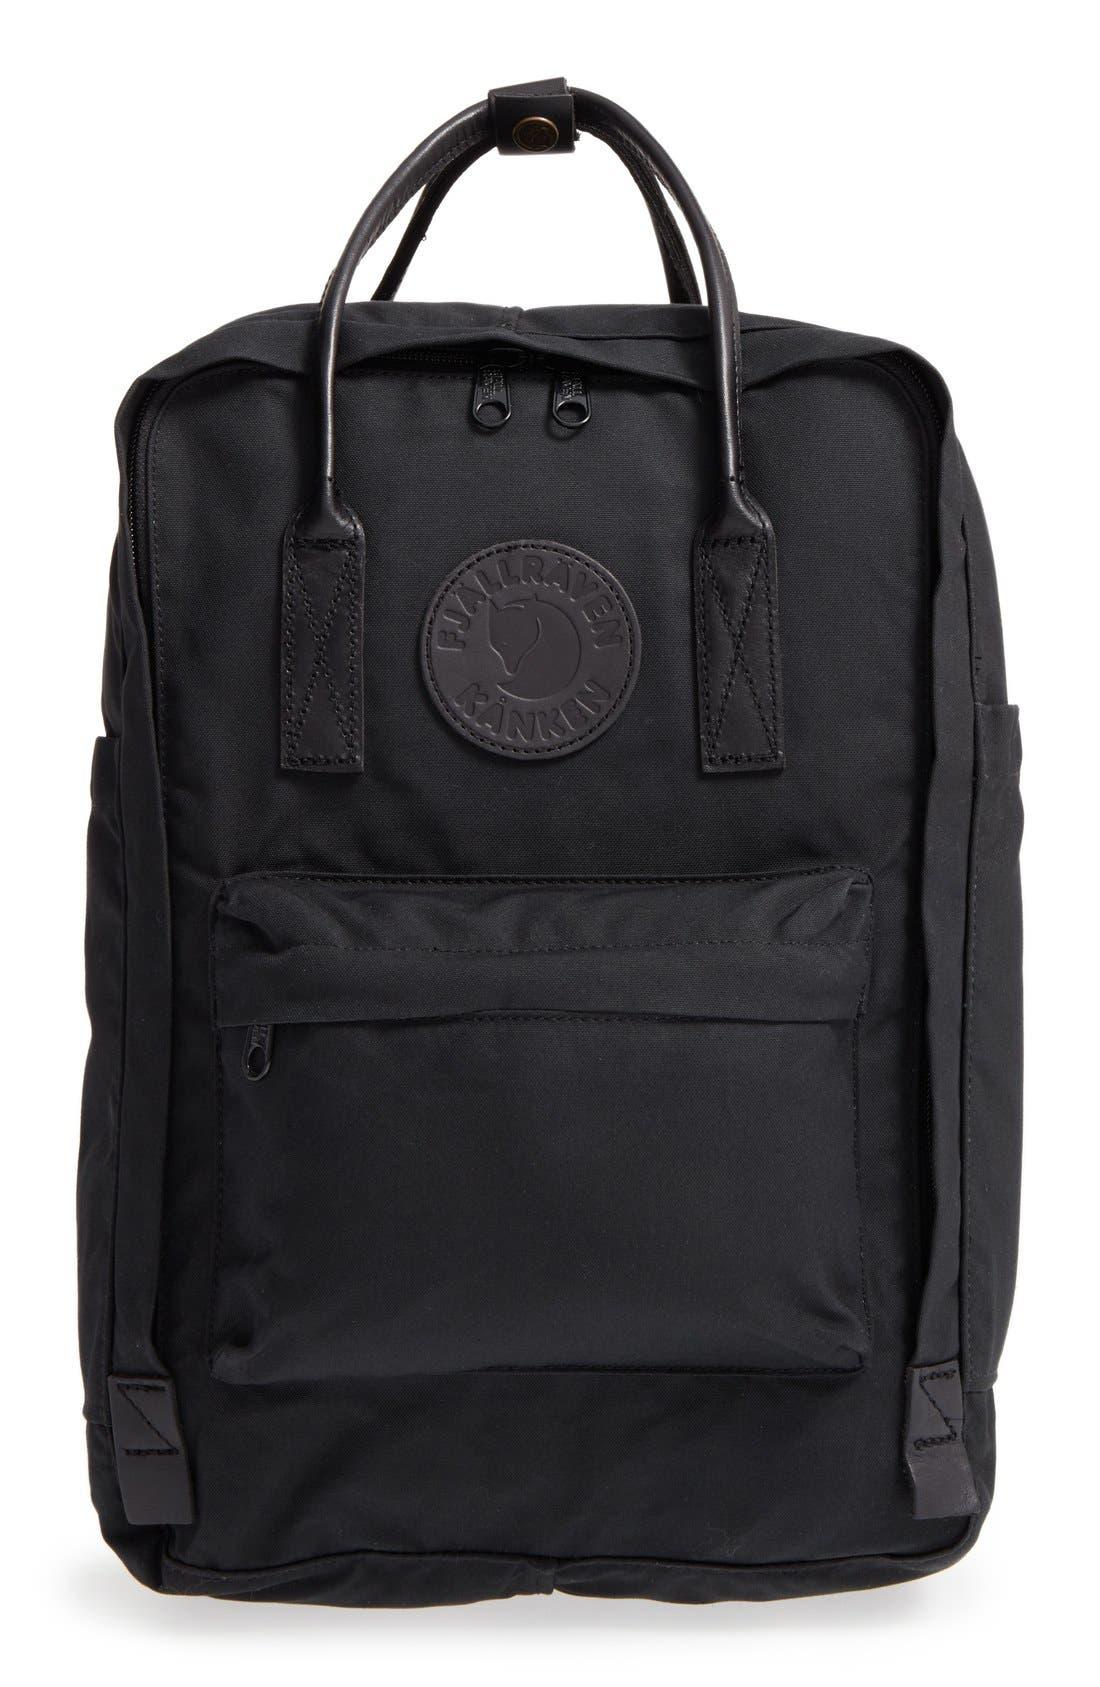 Kånken No. 2 Laptop Backpack,                             Main thumbnail 1, color,                             BLACK